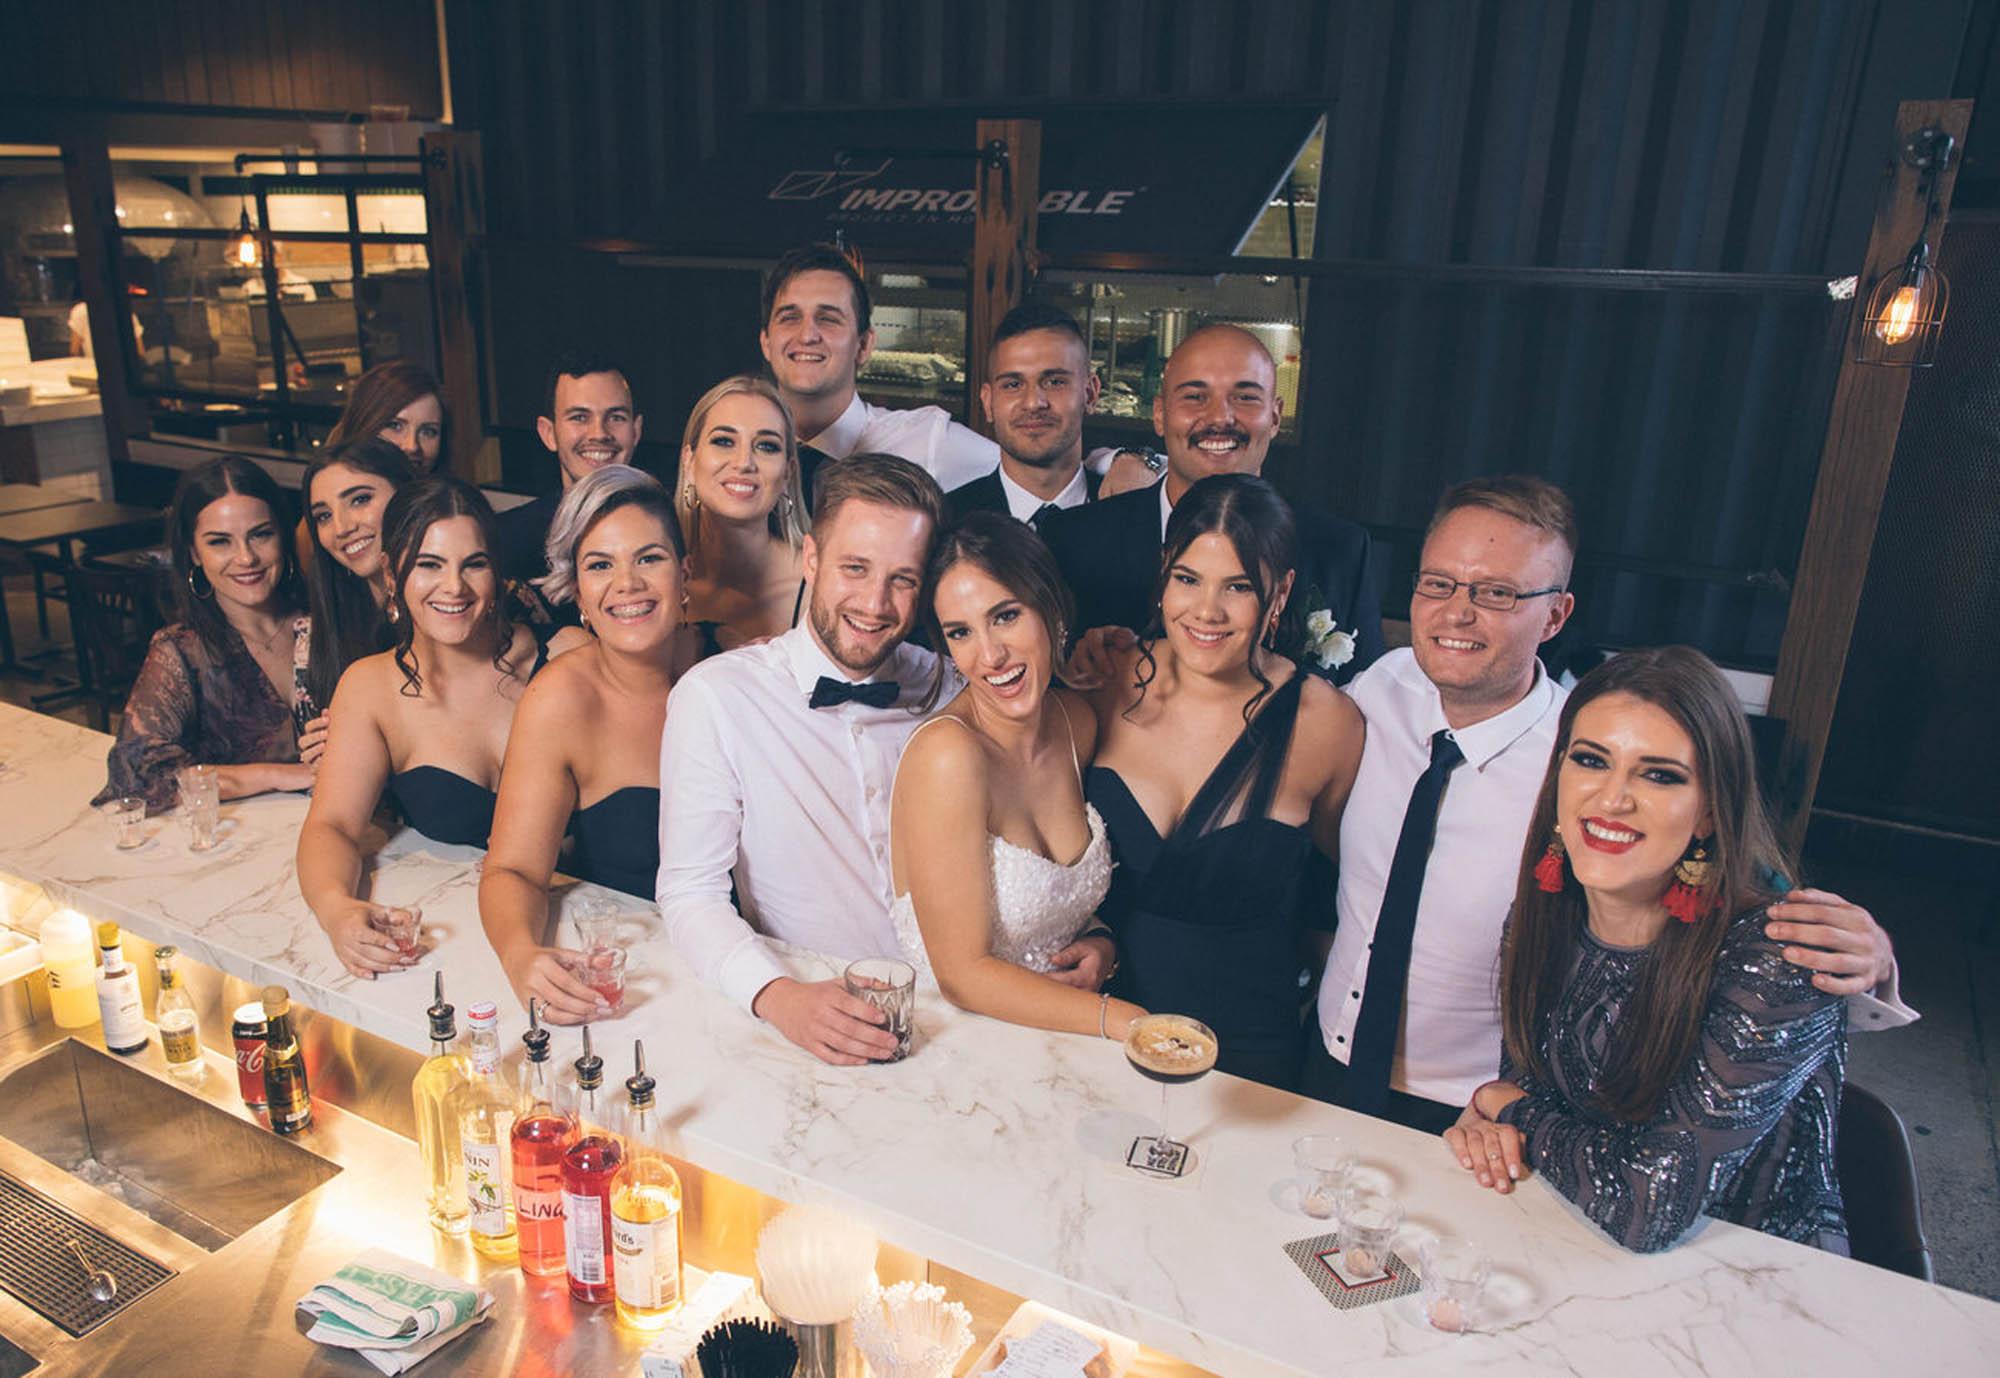 MacDougall-Photography-Sydney-Wedding-Photographers-48.jpg